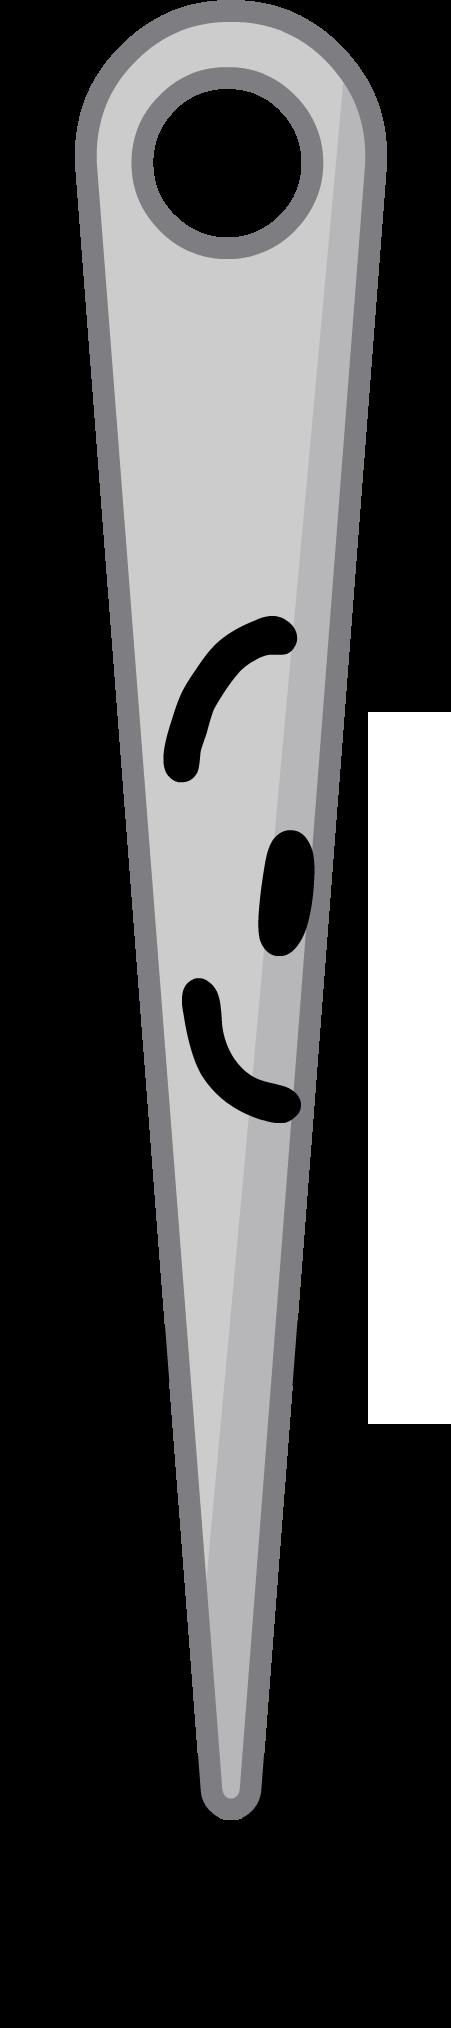 Snaz Needle.png